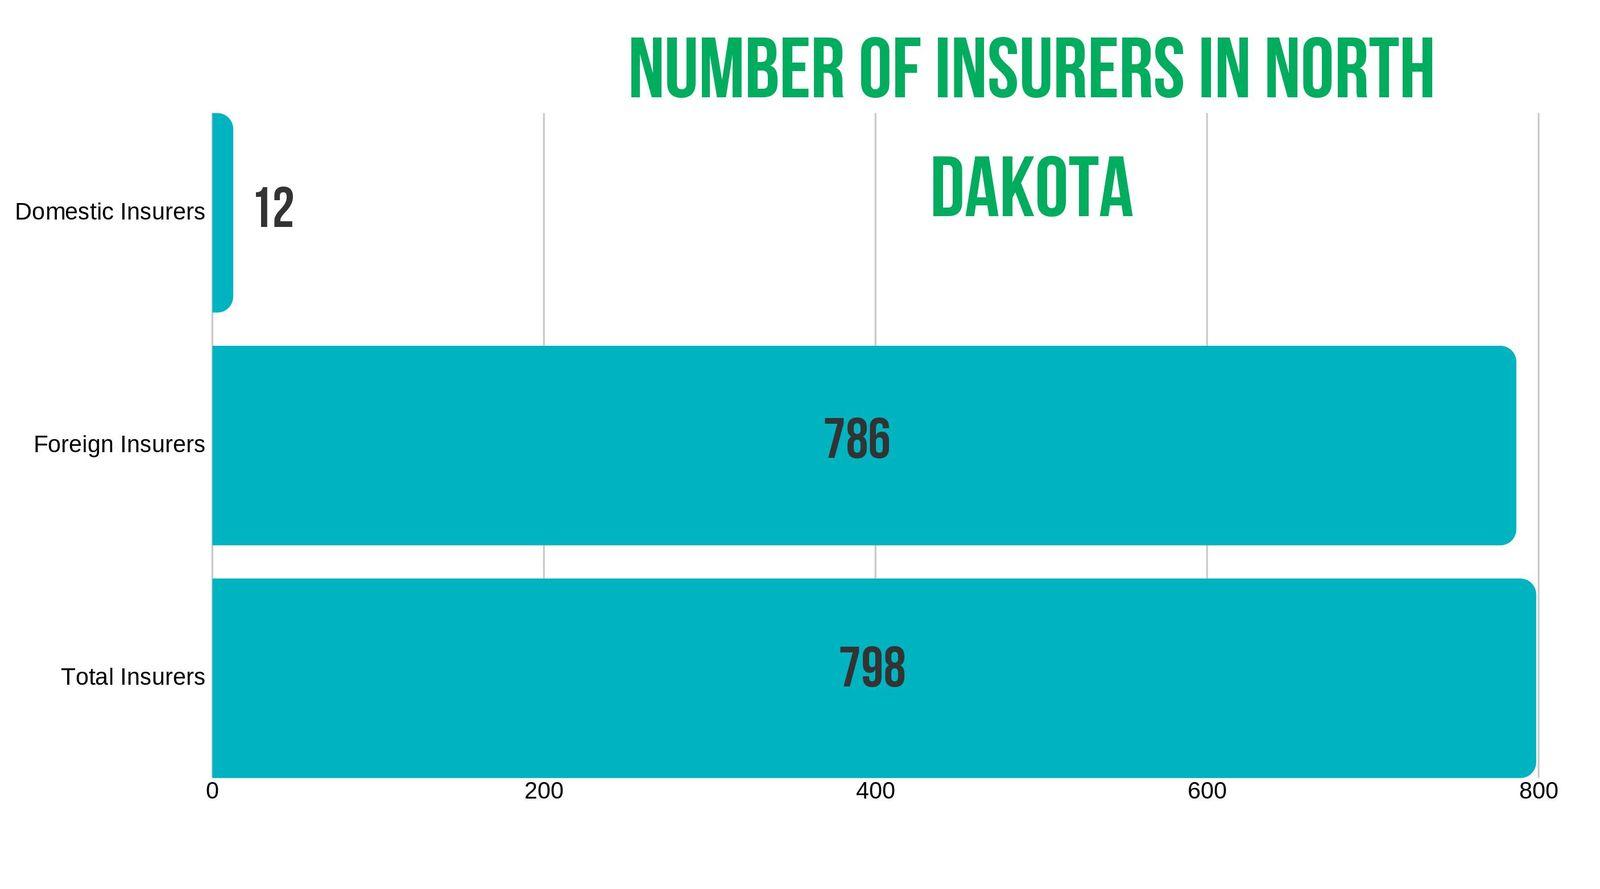 North Dakota number of insurers-